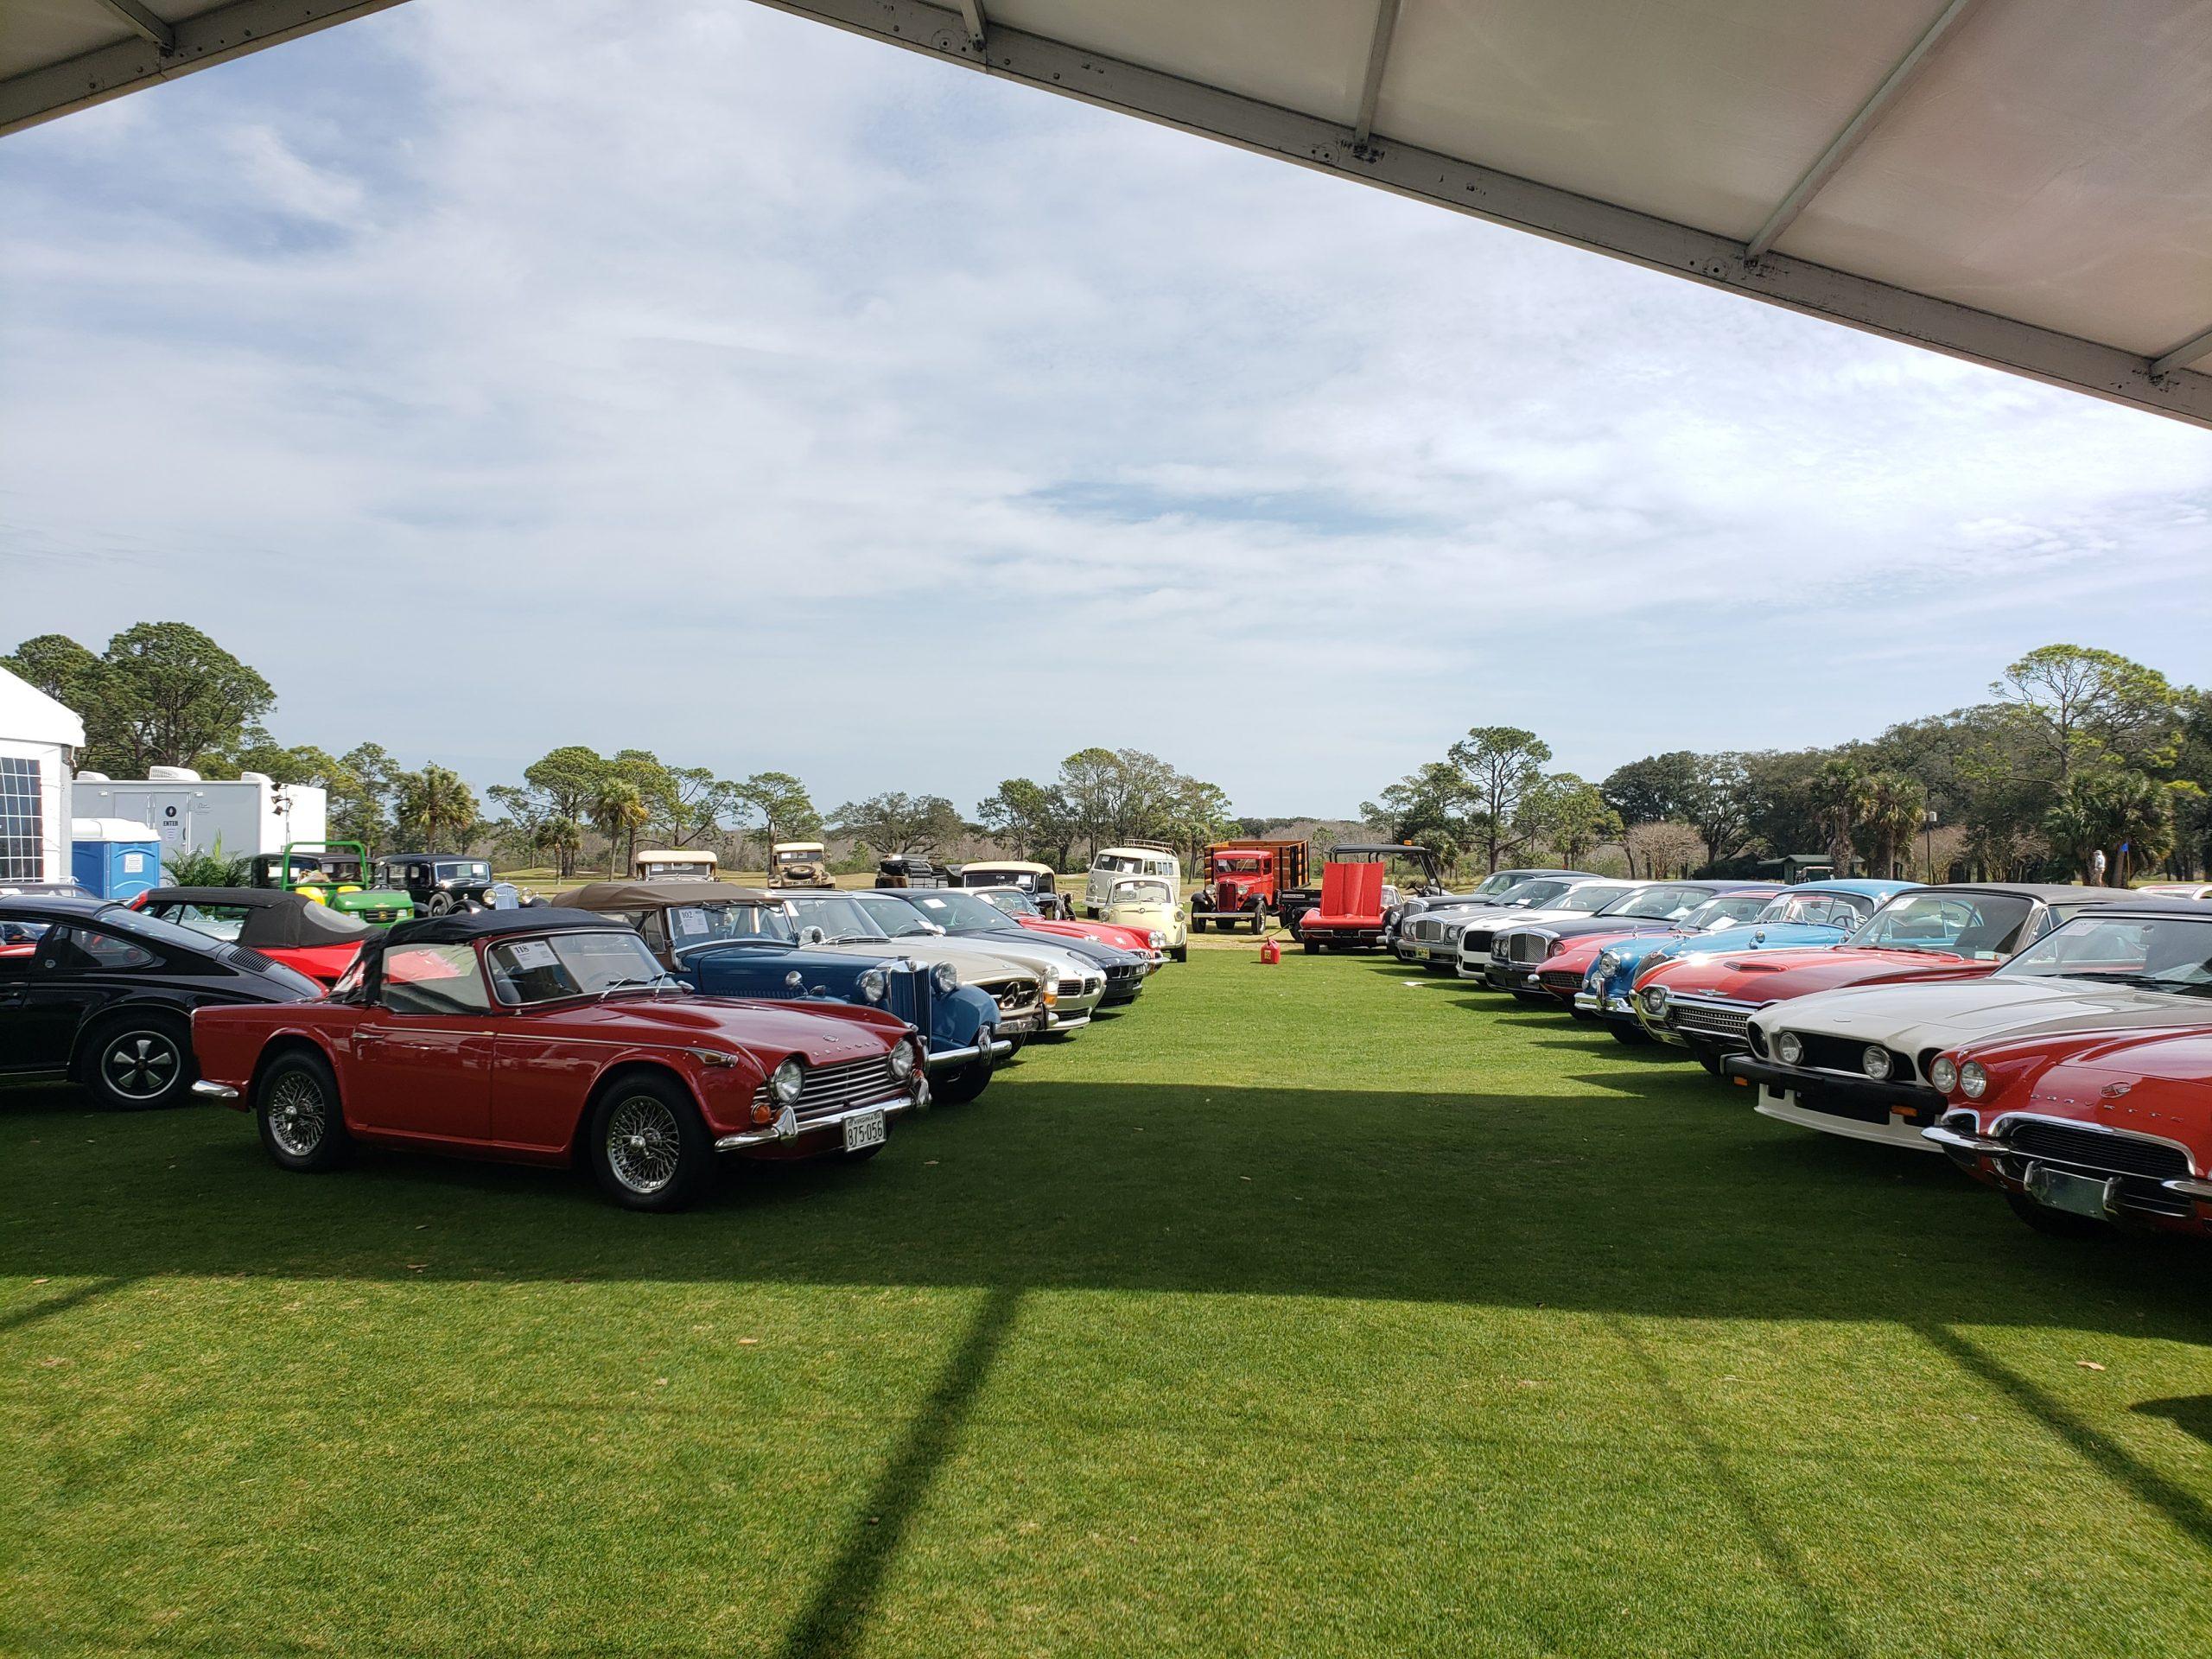 Bonham's Auto Auction